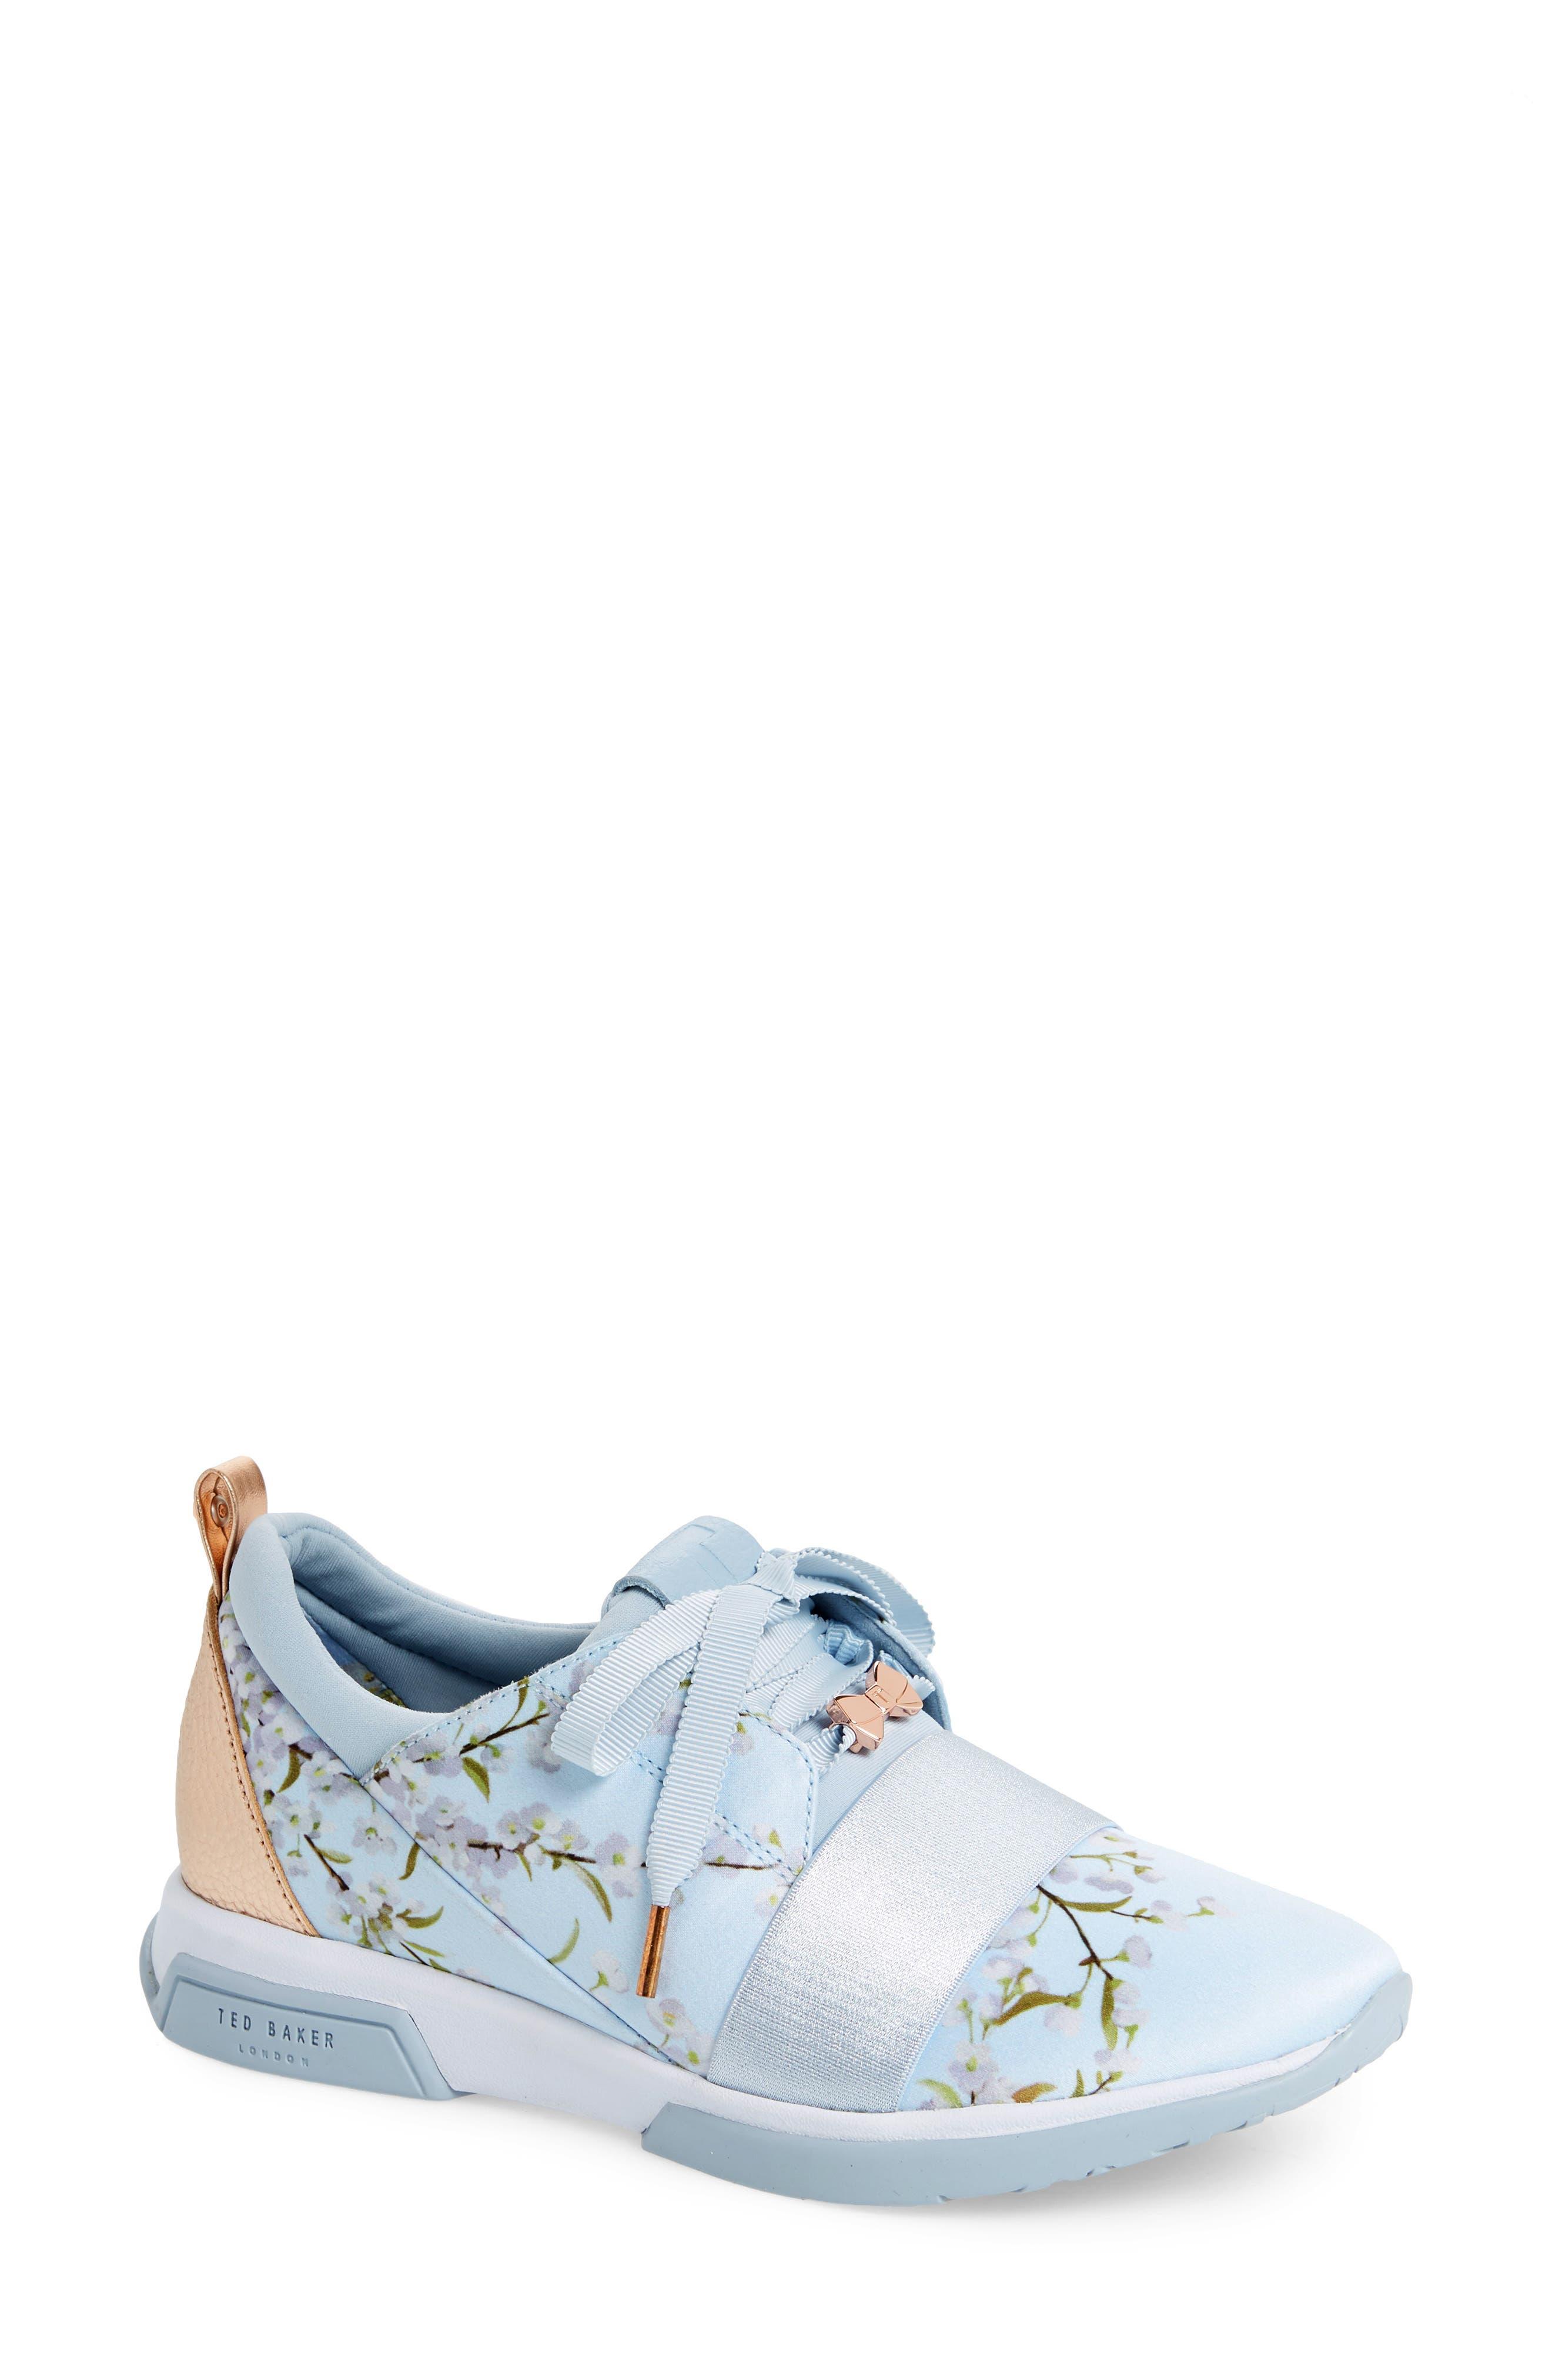 Ted Baker London Cepap Floral Sneaker, Blue